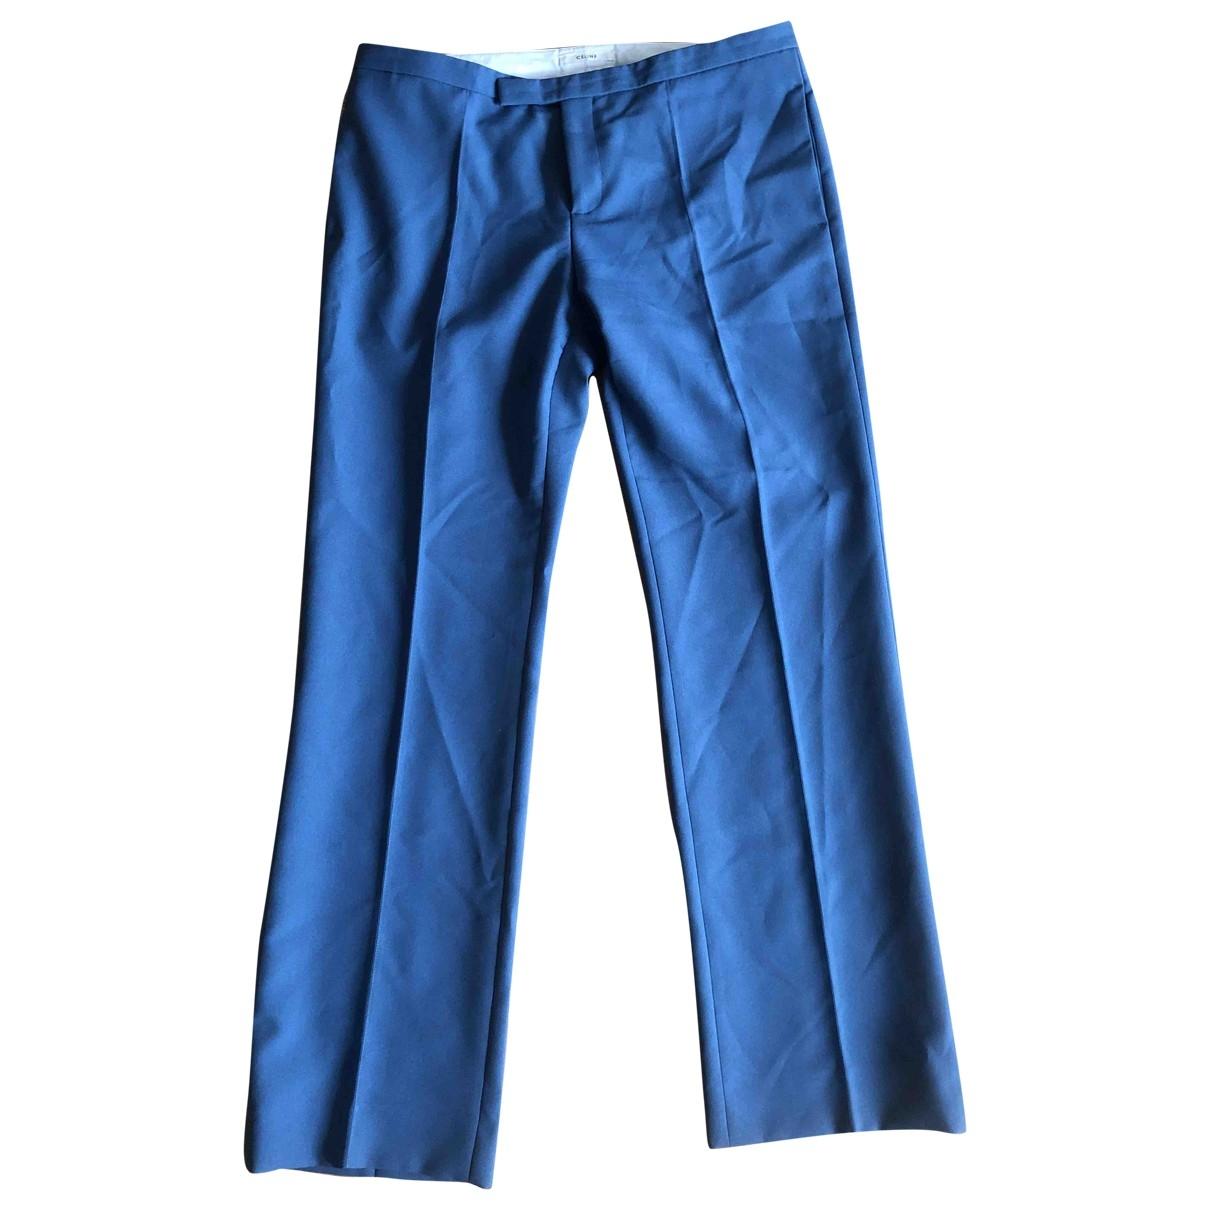 Pantalones en Poliester Azul Celine